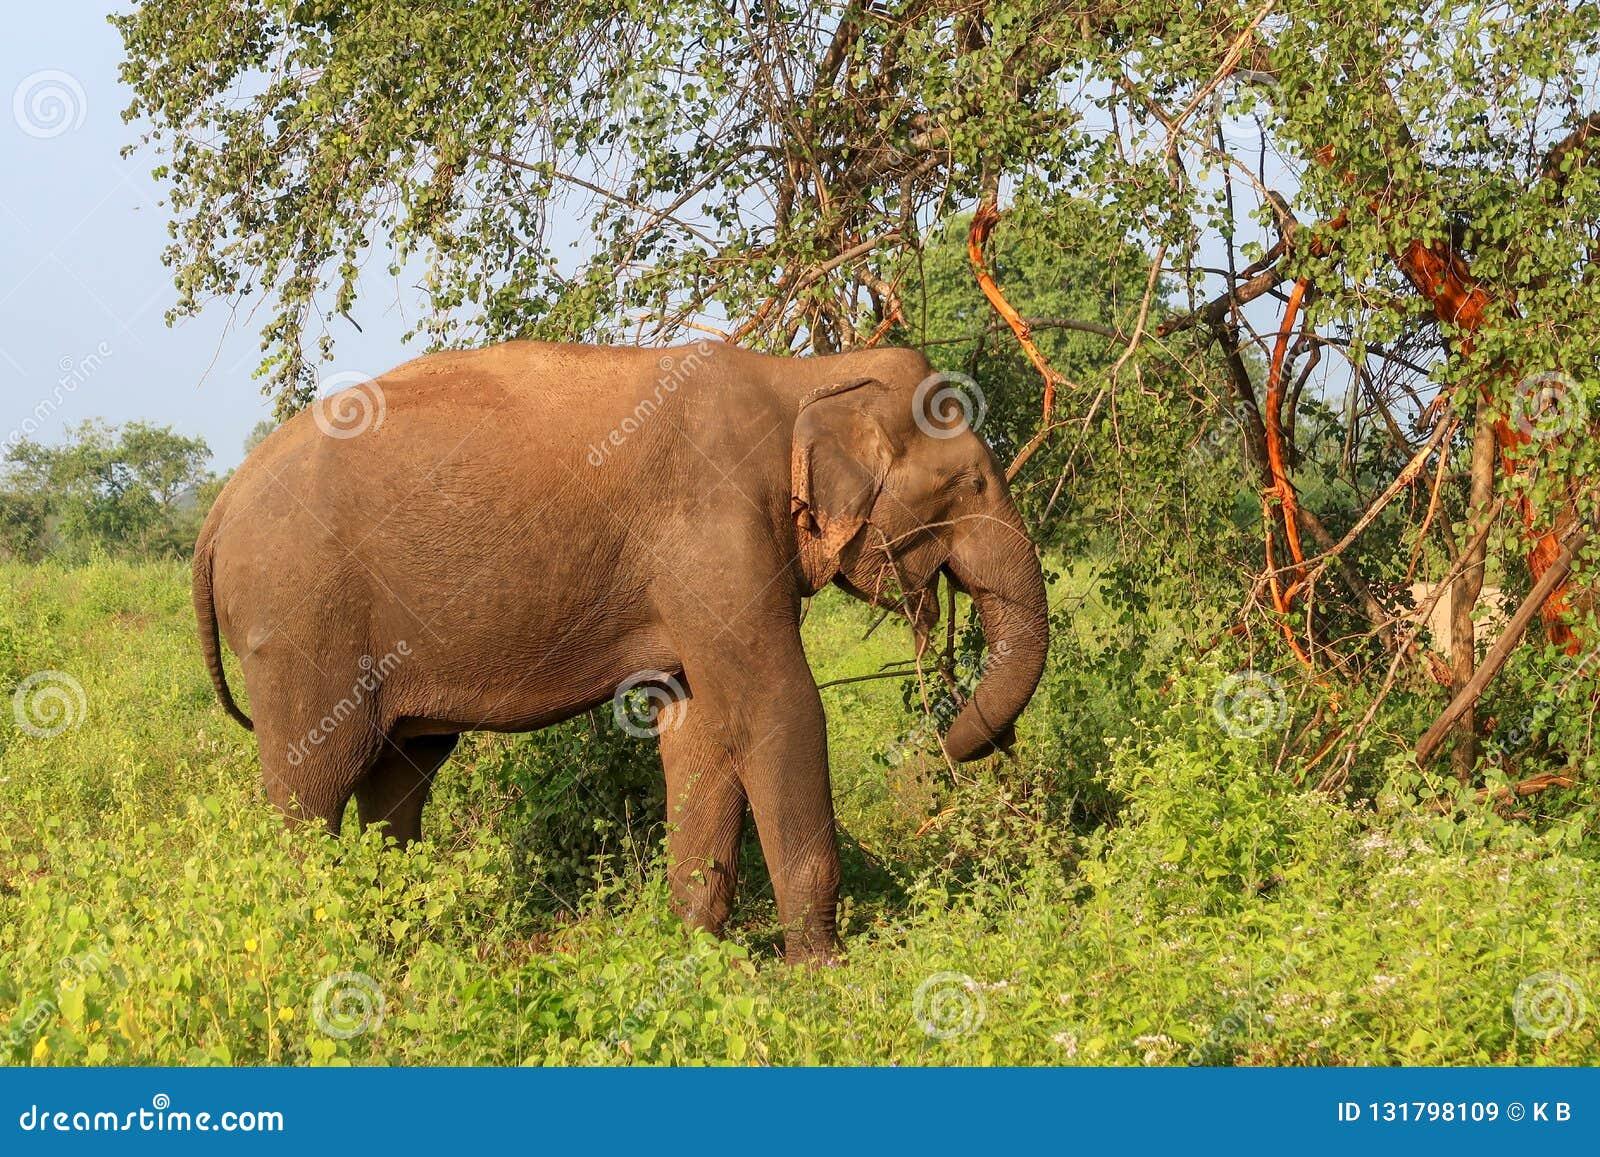 Дикий азиатский слон в Шри-Ланка, сафари национального парка Udawalawe